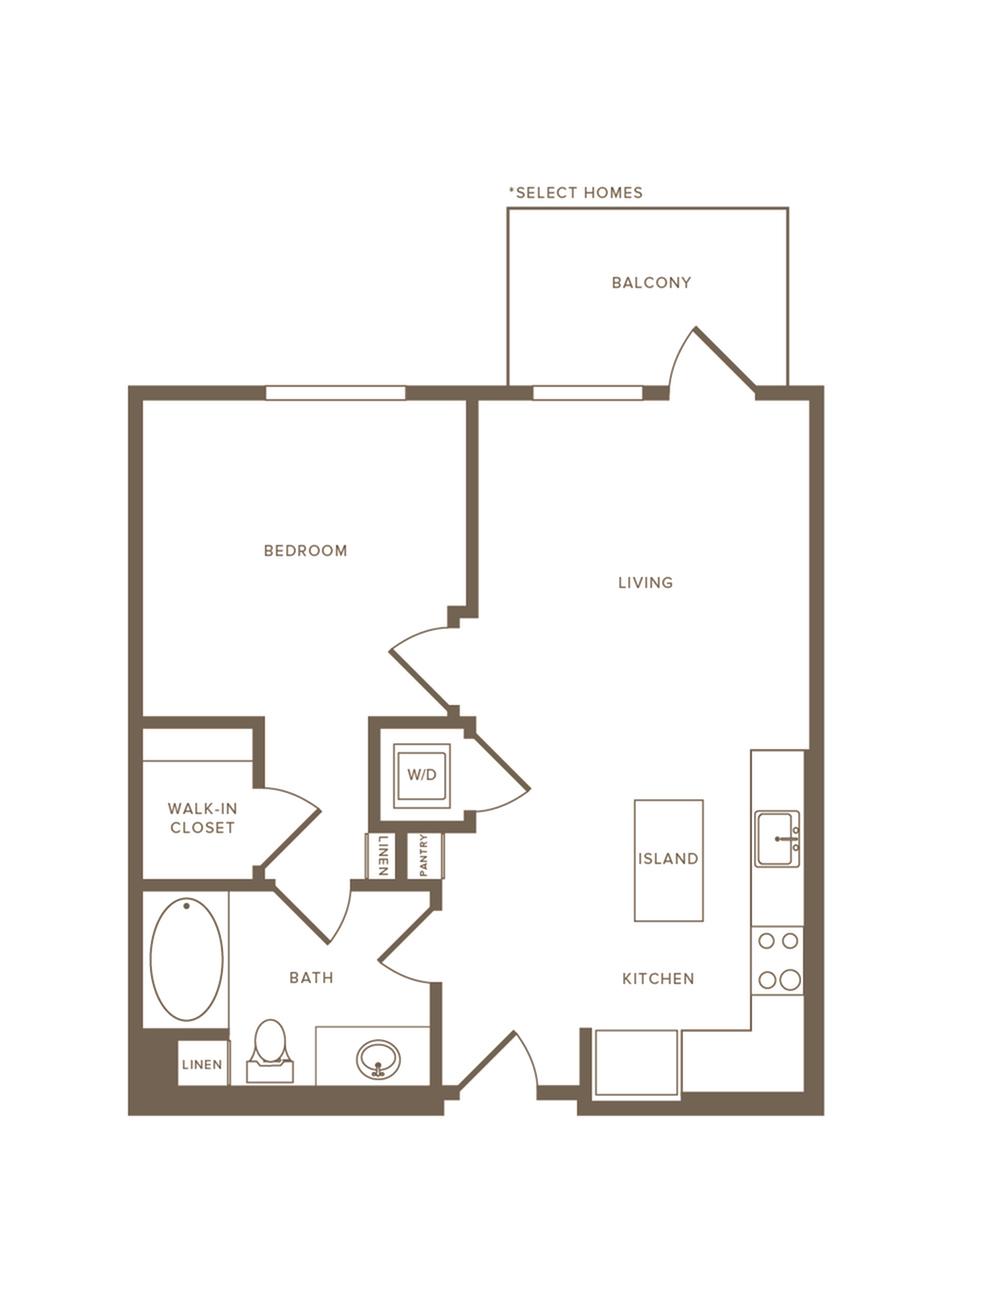 707-713 square foot one bedroom one bath floor plan image